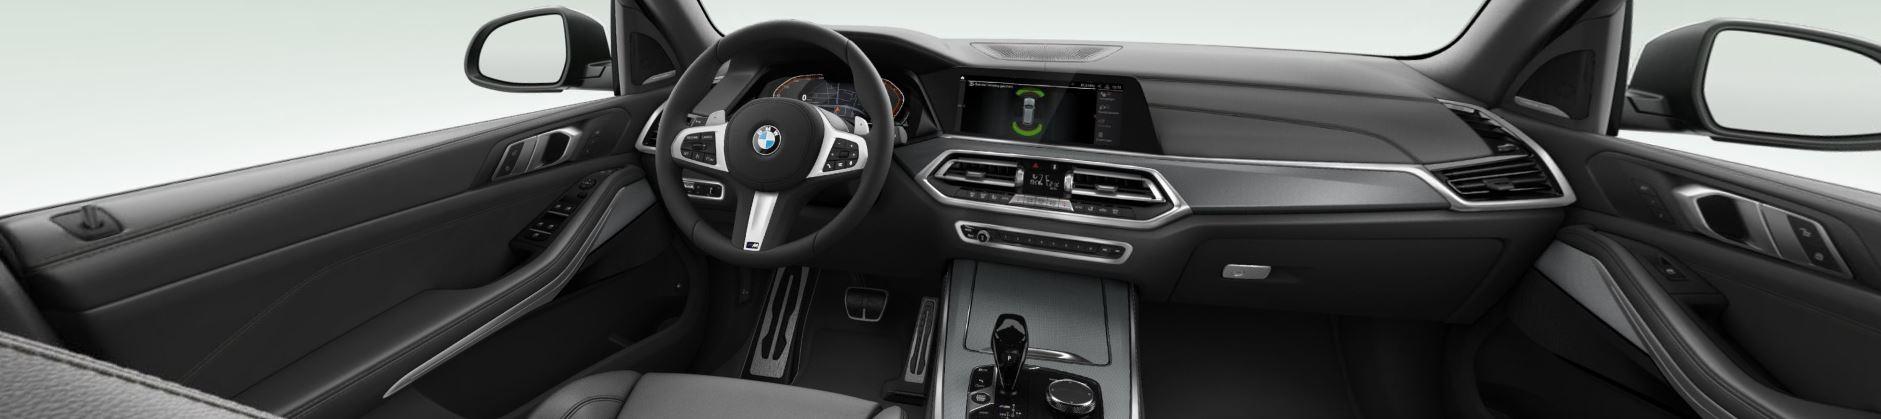 BMW-X5-xDrive25d-M-pakiet-14